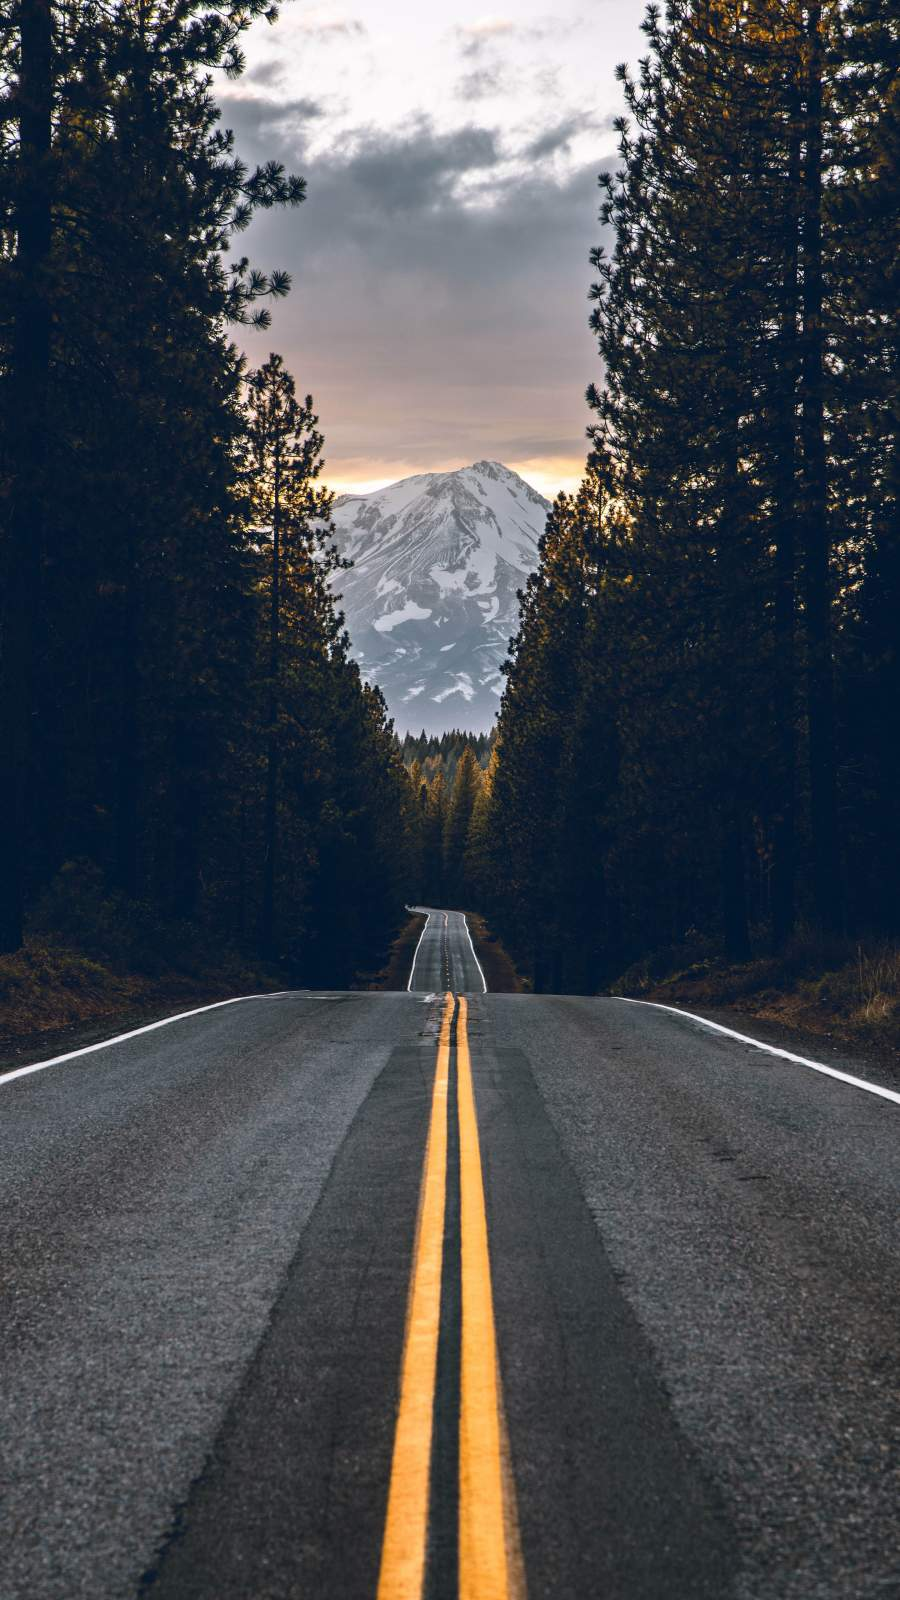 Mountain Roads iPhone Wallpaper